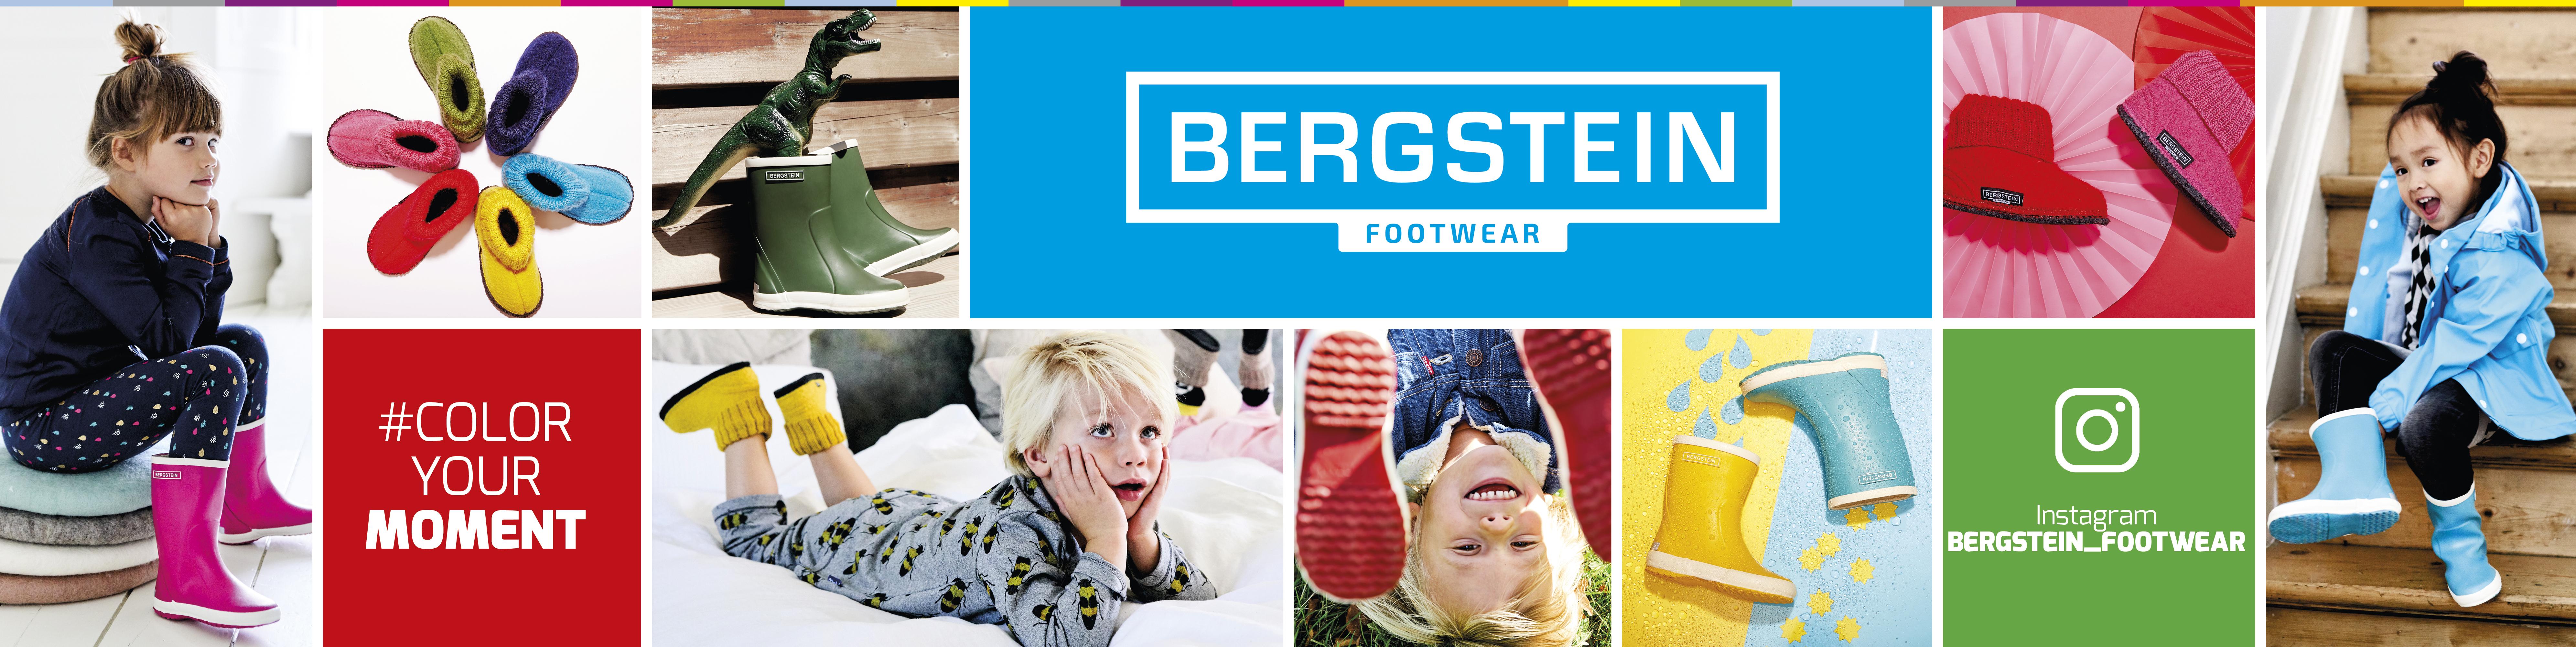 Bergstein Sko | Barnesko | Kjøp nye barnesko på nett hos Zalando